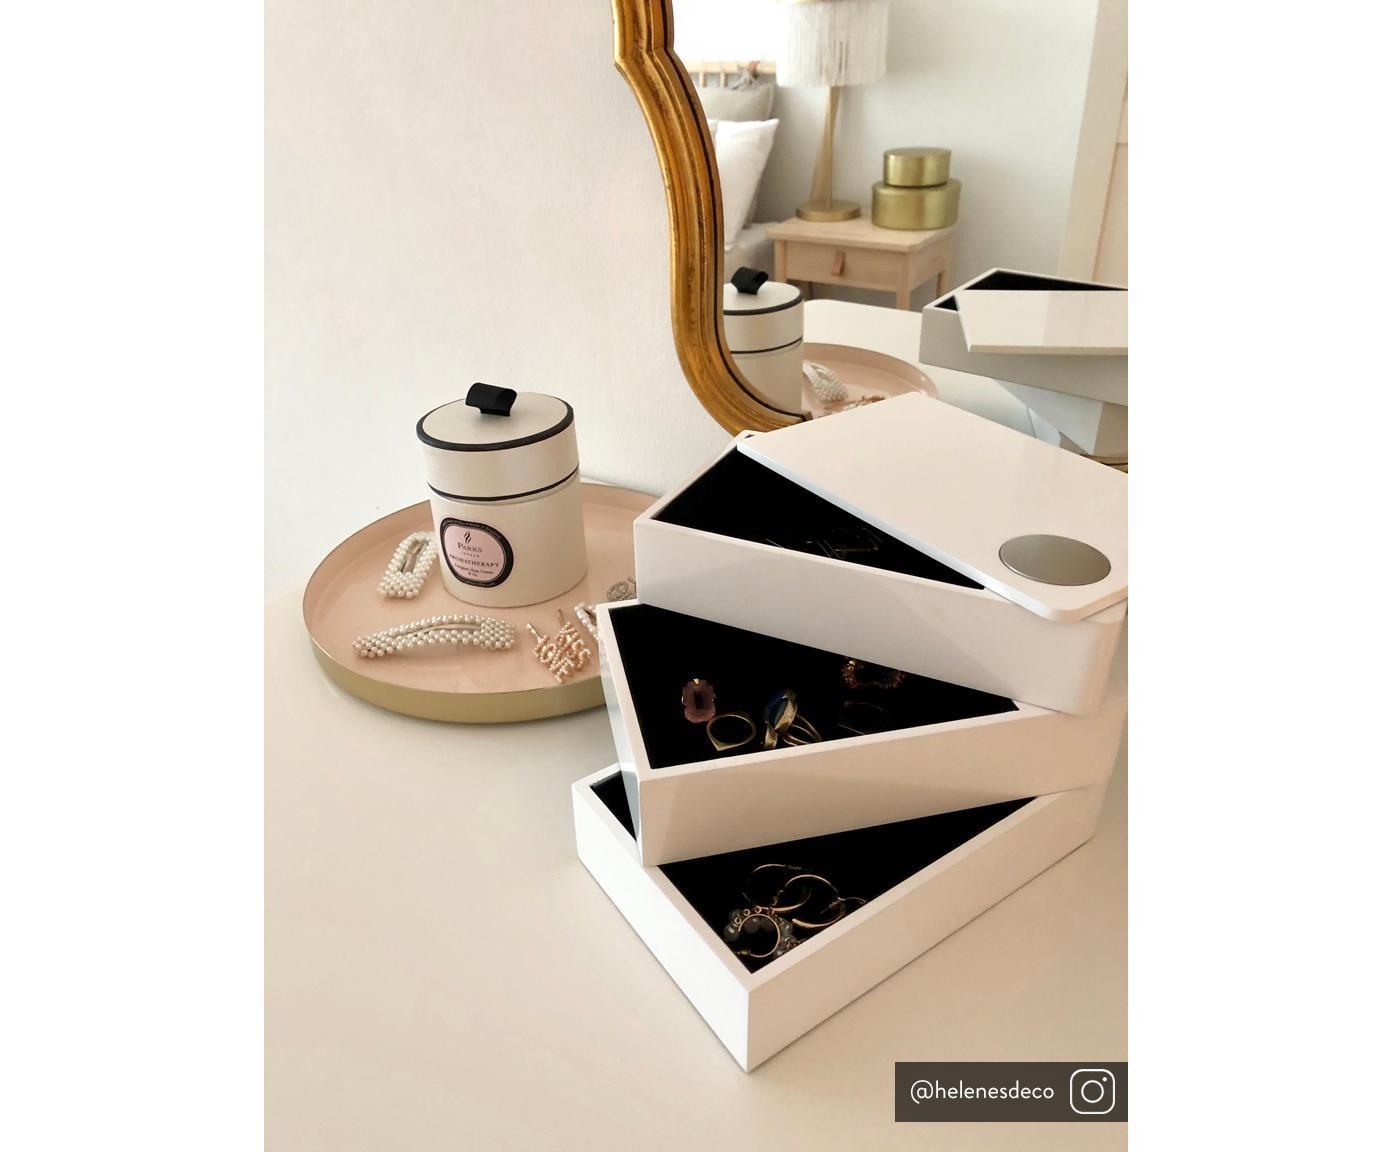 Sieradendoos Spindle, Gelakt beukenhout, Wit, 19 x 13 cm